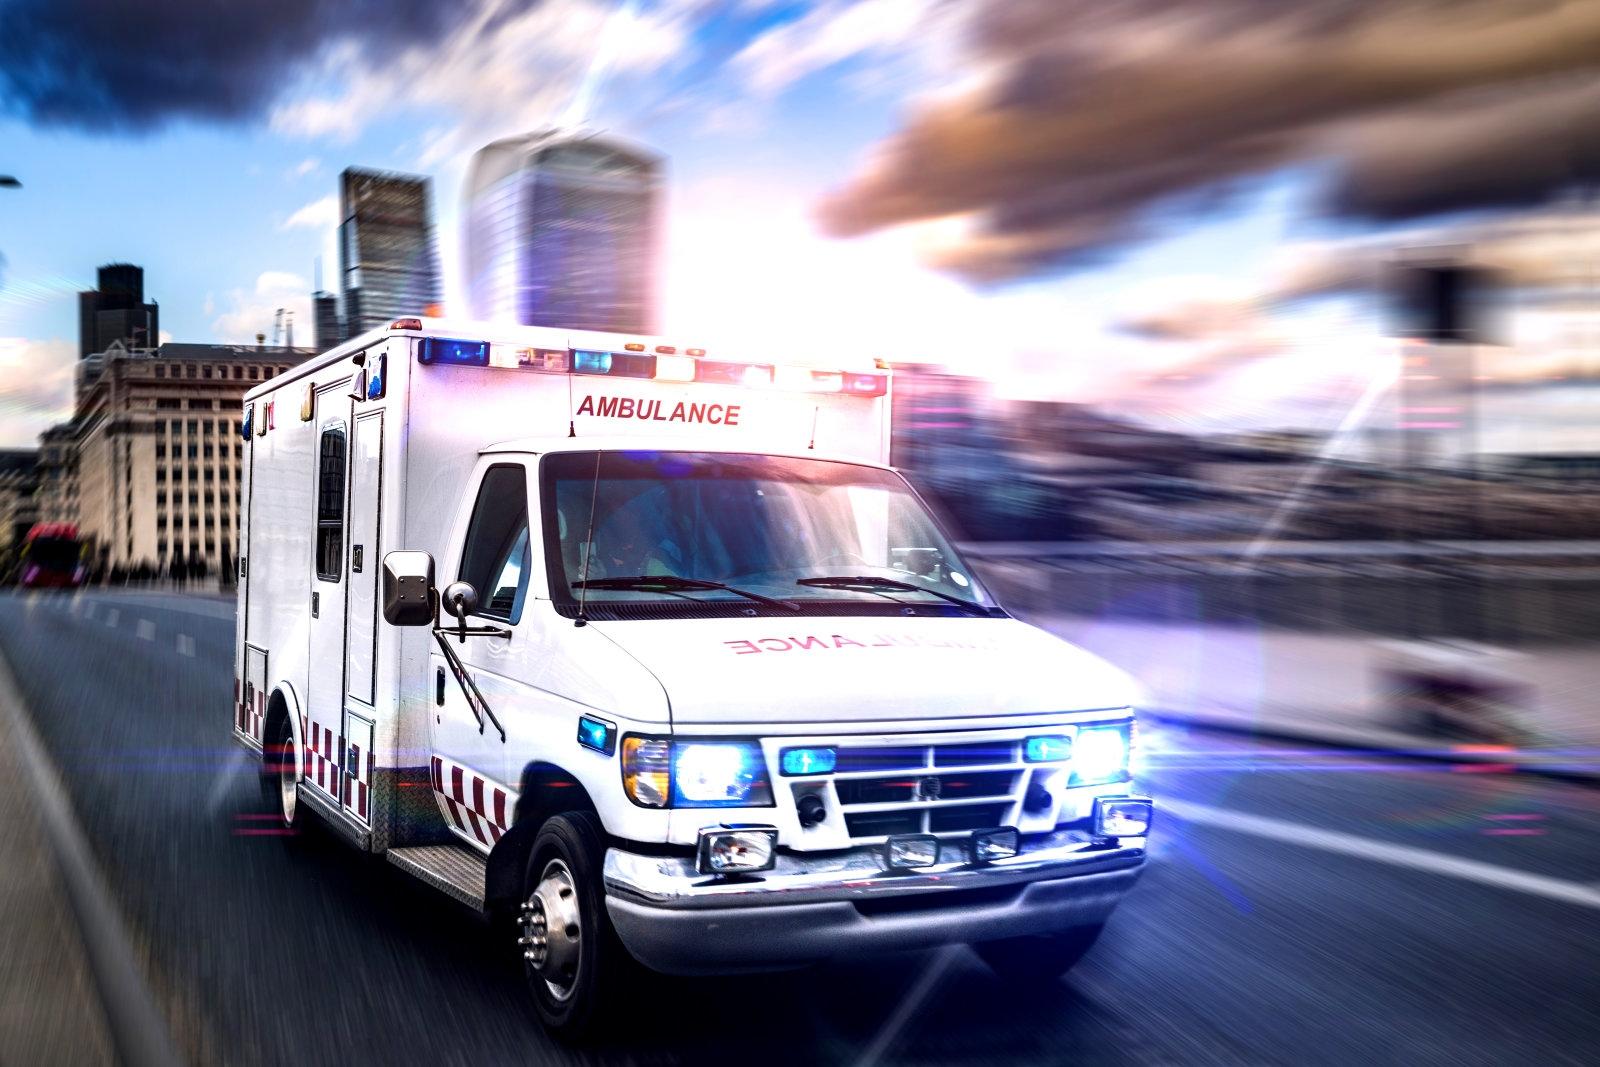 AI helps Dutch emergency dispatchers diagnose heart attacks | DeviceDaily.com